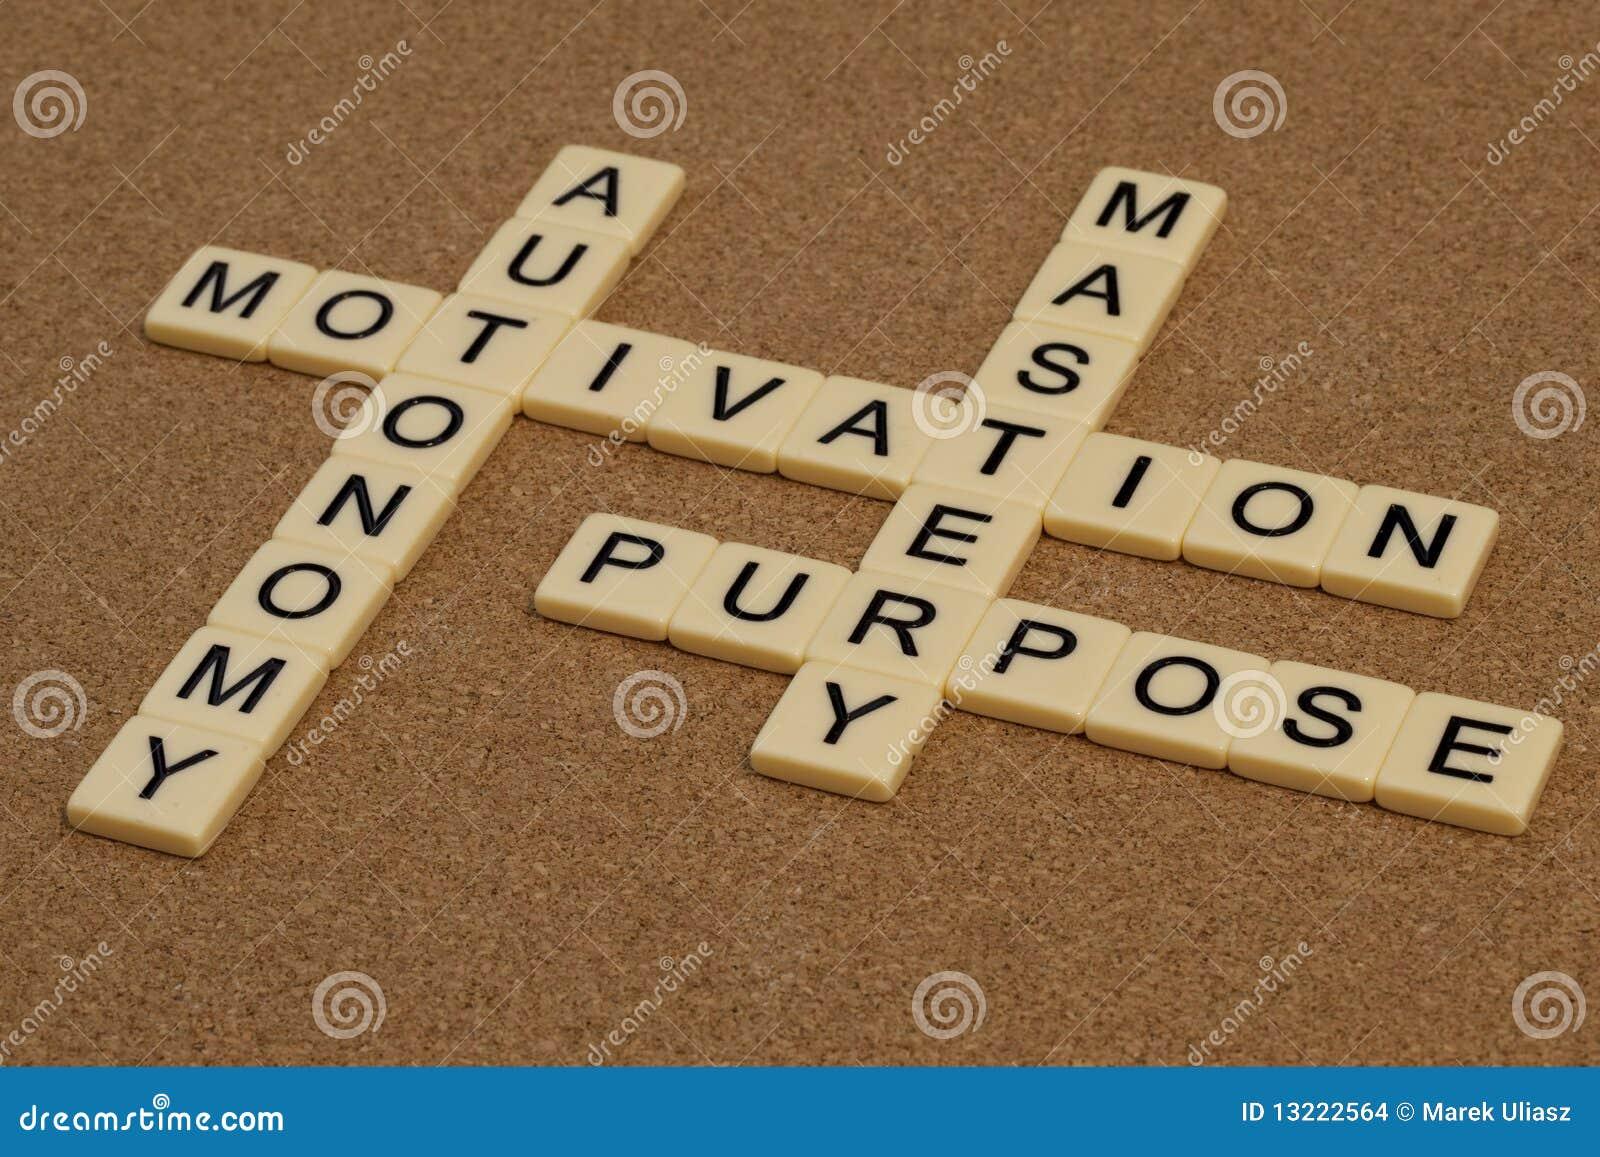 Maestría, autonomía, propósito, motivación